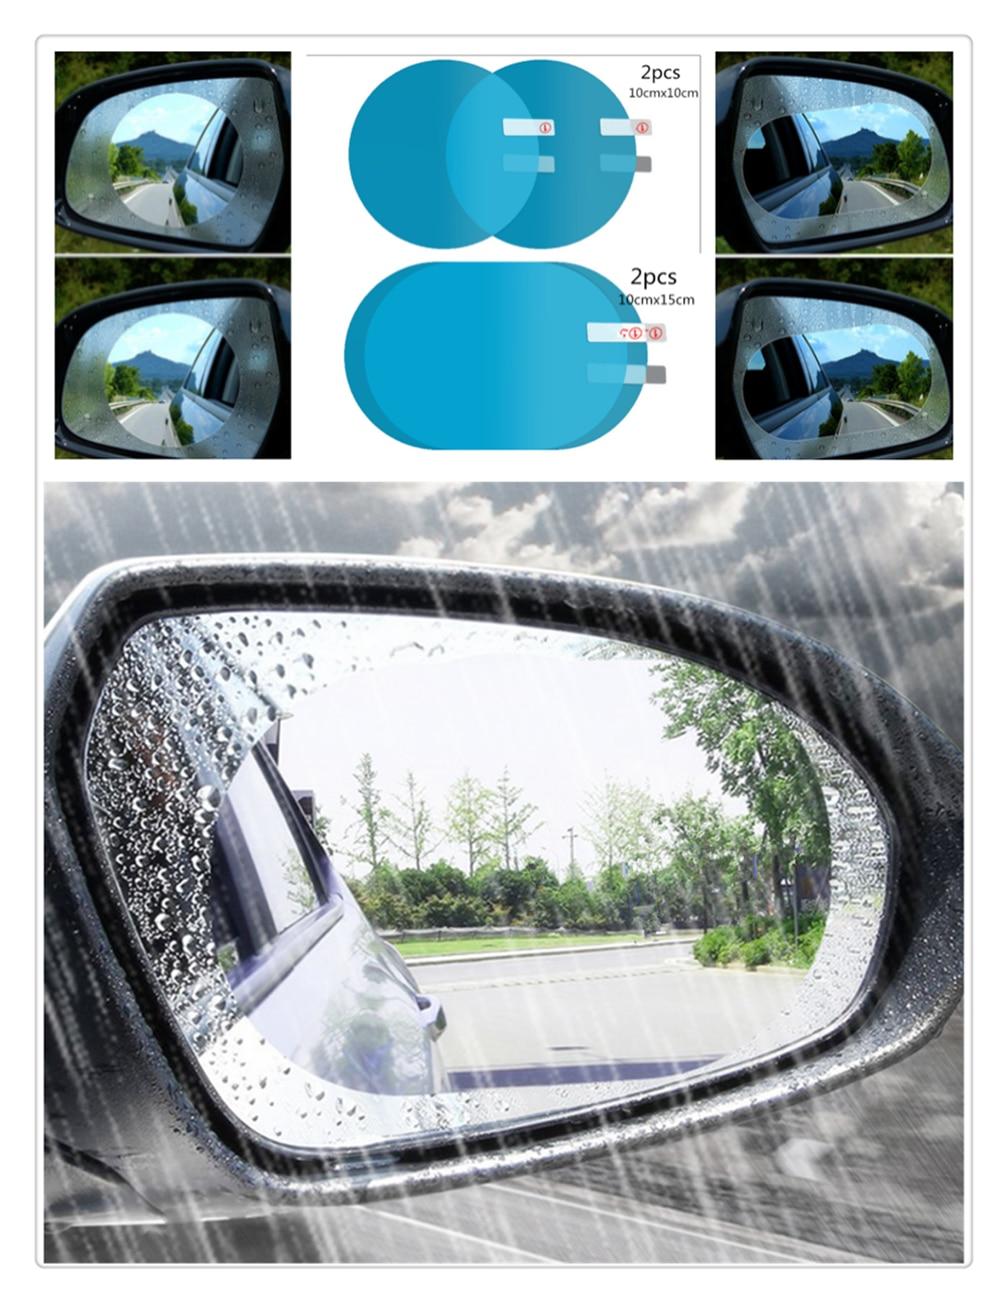 Filme anti-fog espelho retrovisor do carro chuva vara universal para Renault Talismã Trezor Do Alasca Kwid Espace Kangoo